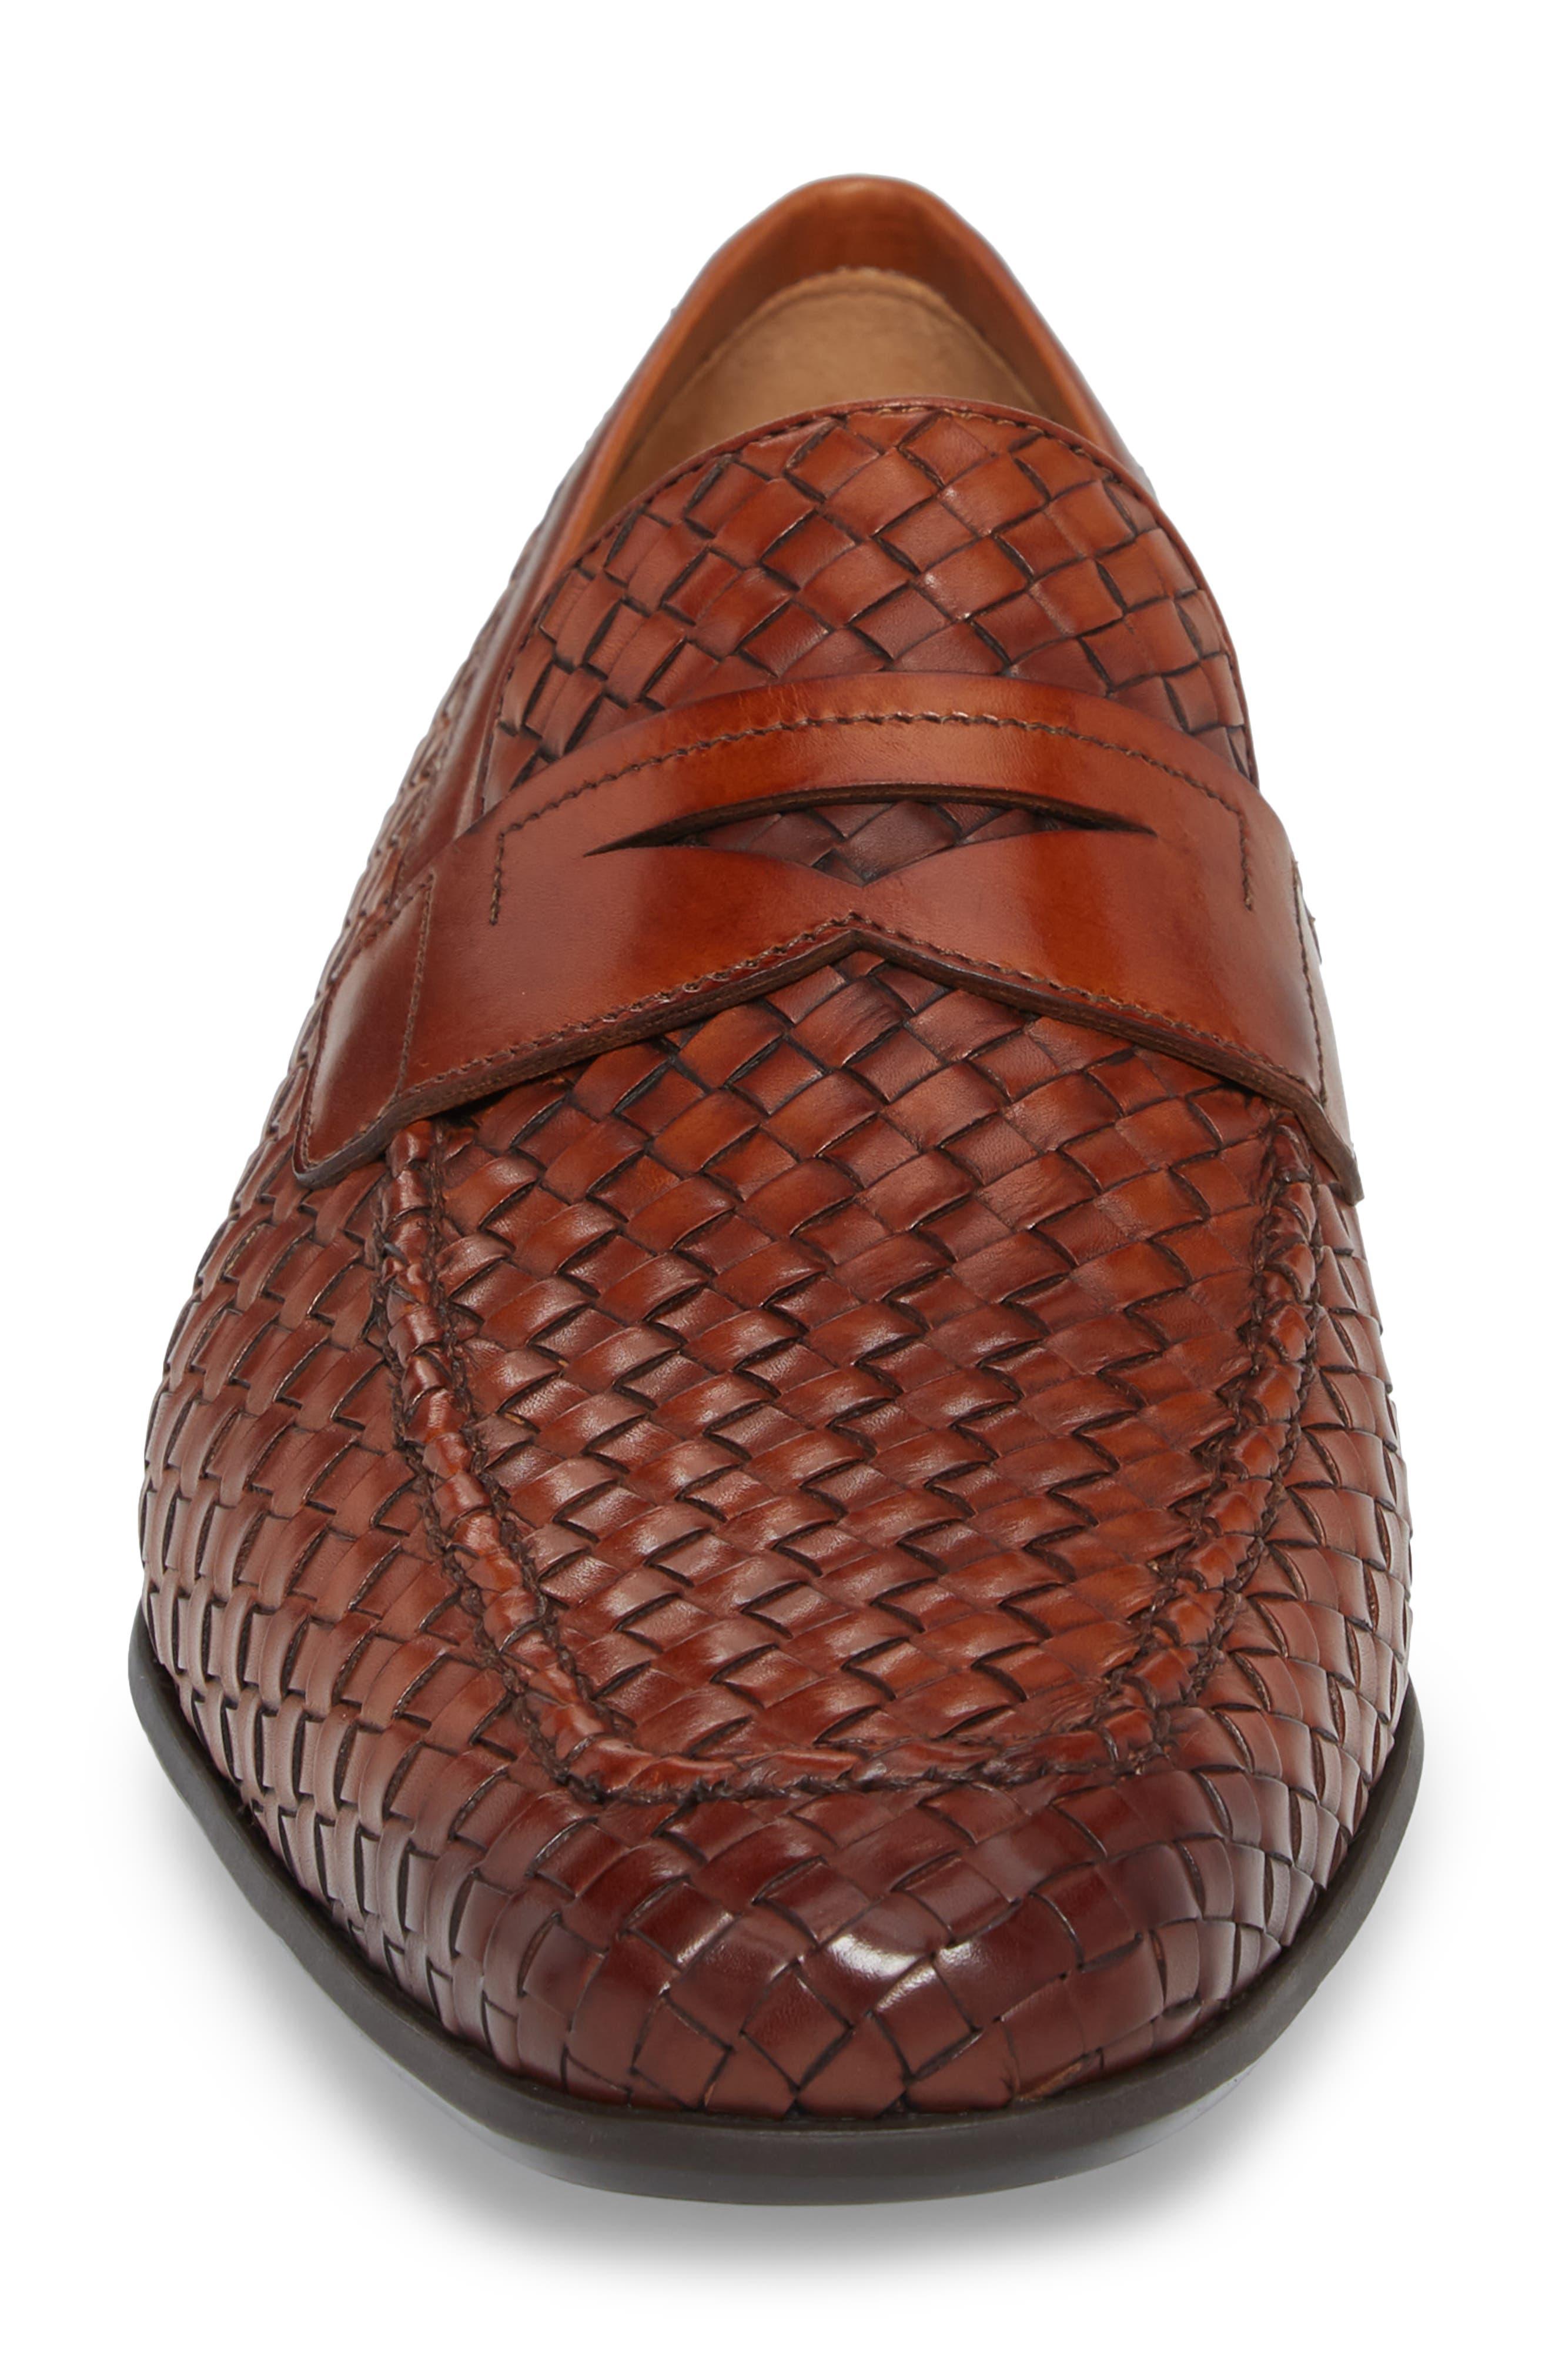 Rafa II Woven Penny Loafer,                             Alternate thumbnail 4, color,                             Cognac Leather